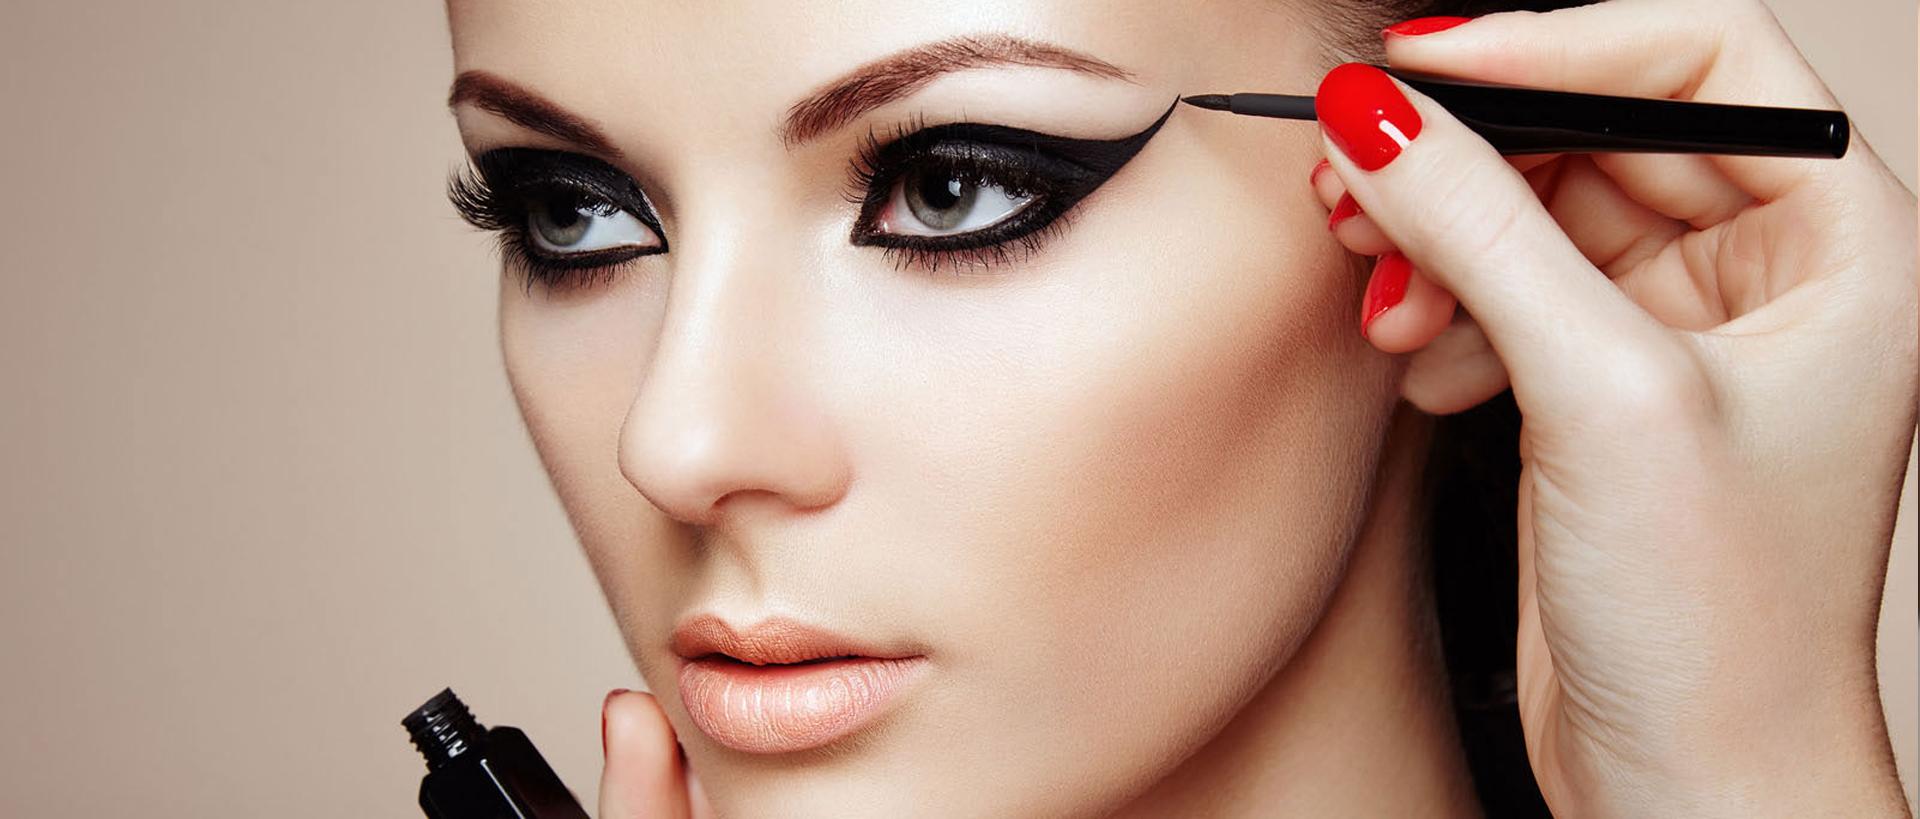 Beauty Treatments